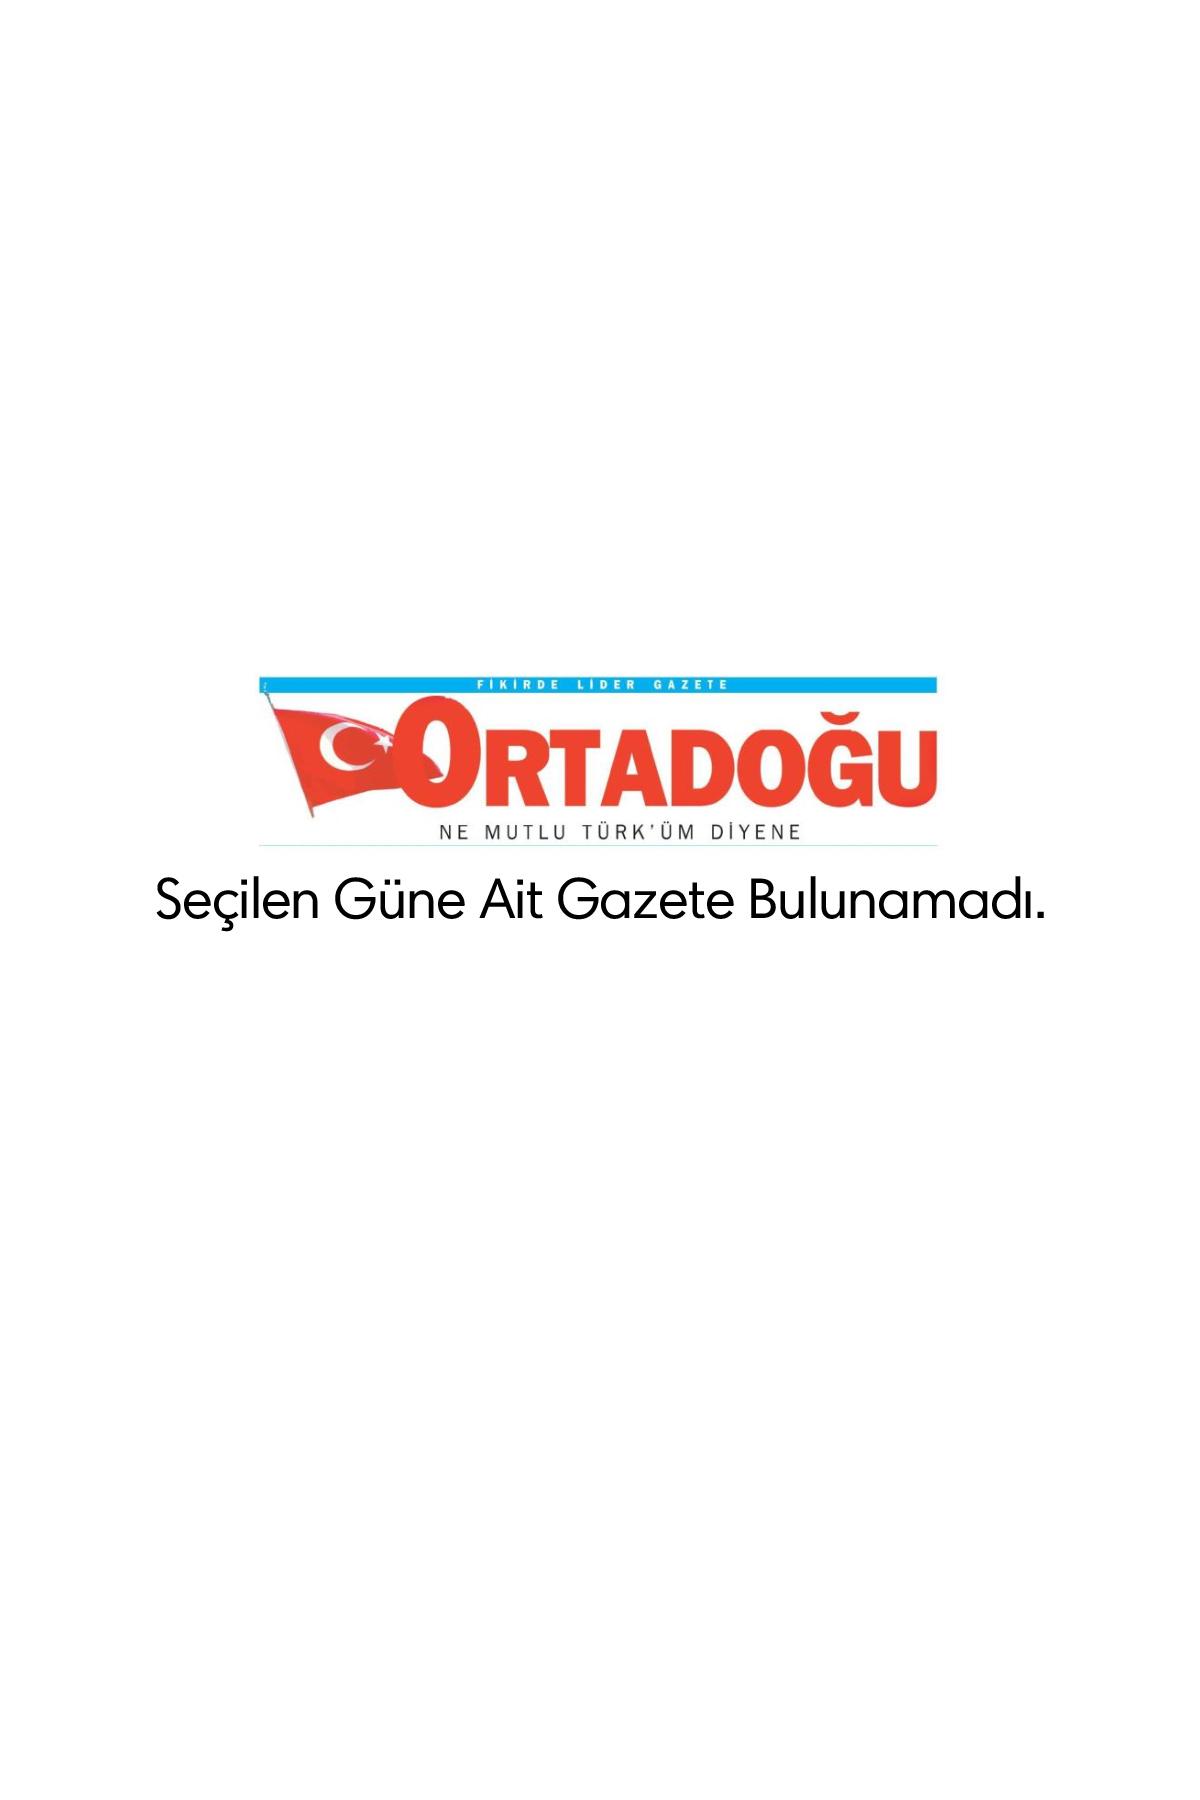 ortadogu